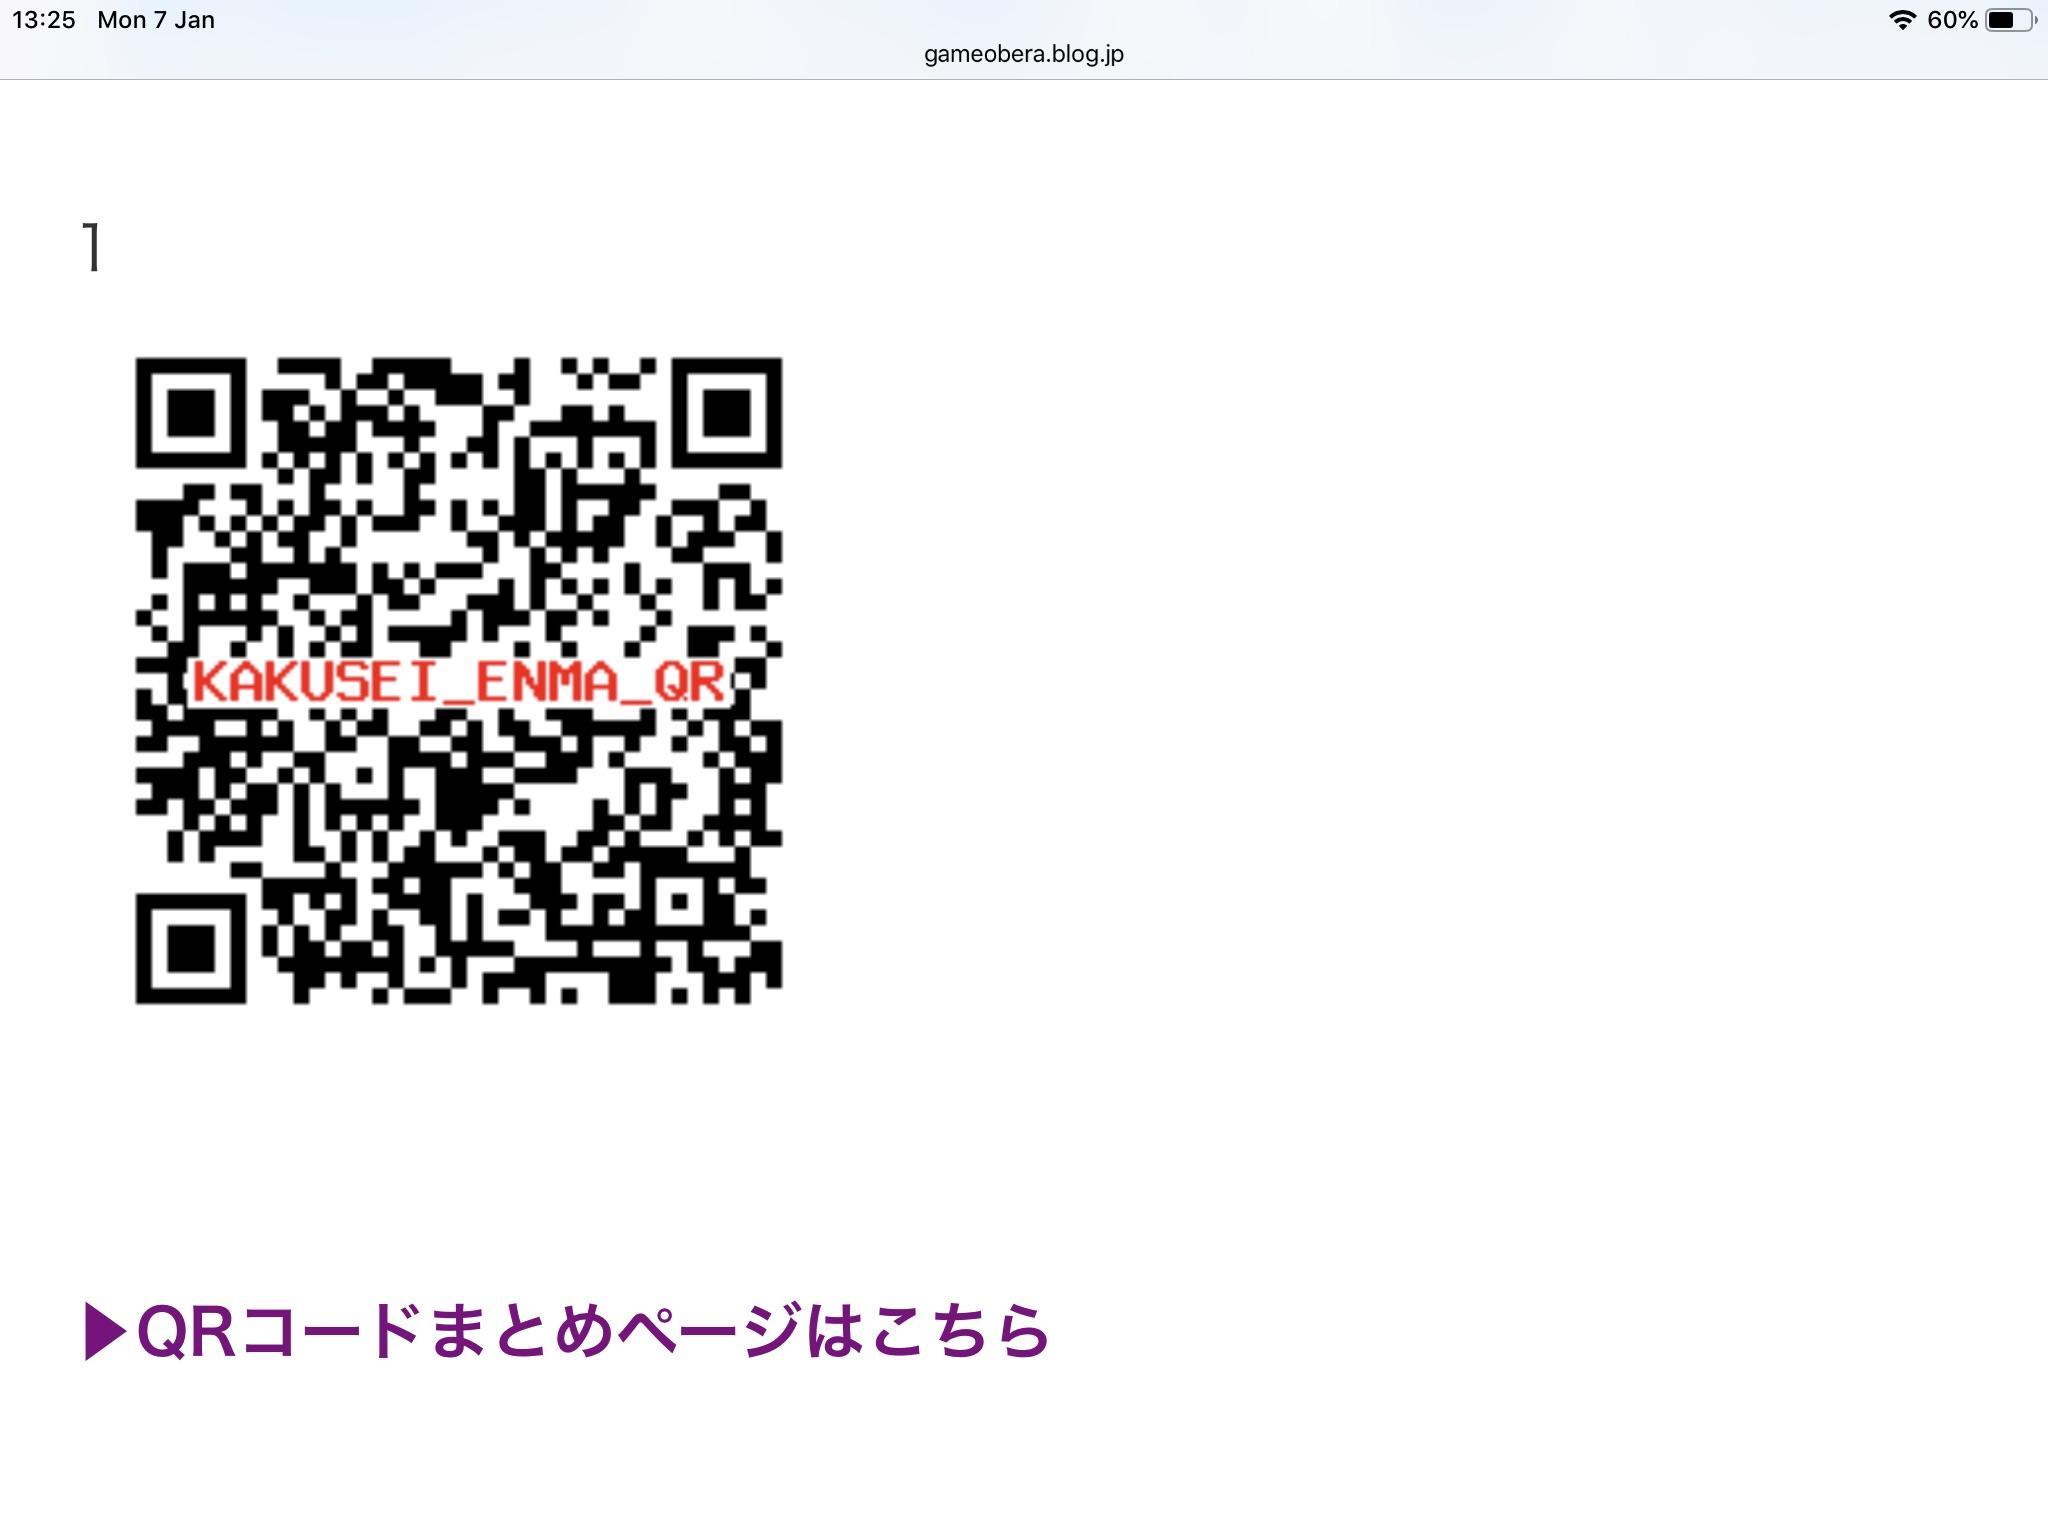 Inferno Report item QR code : yokaiwatch